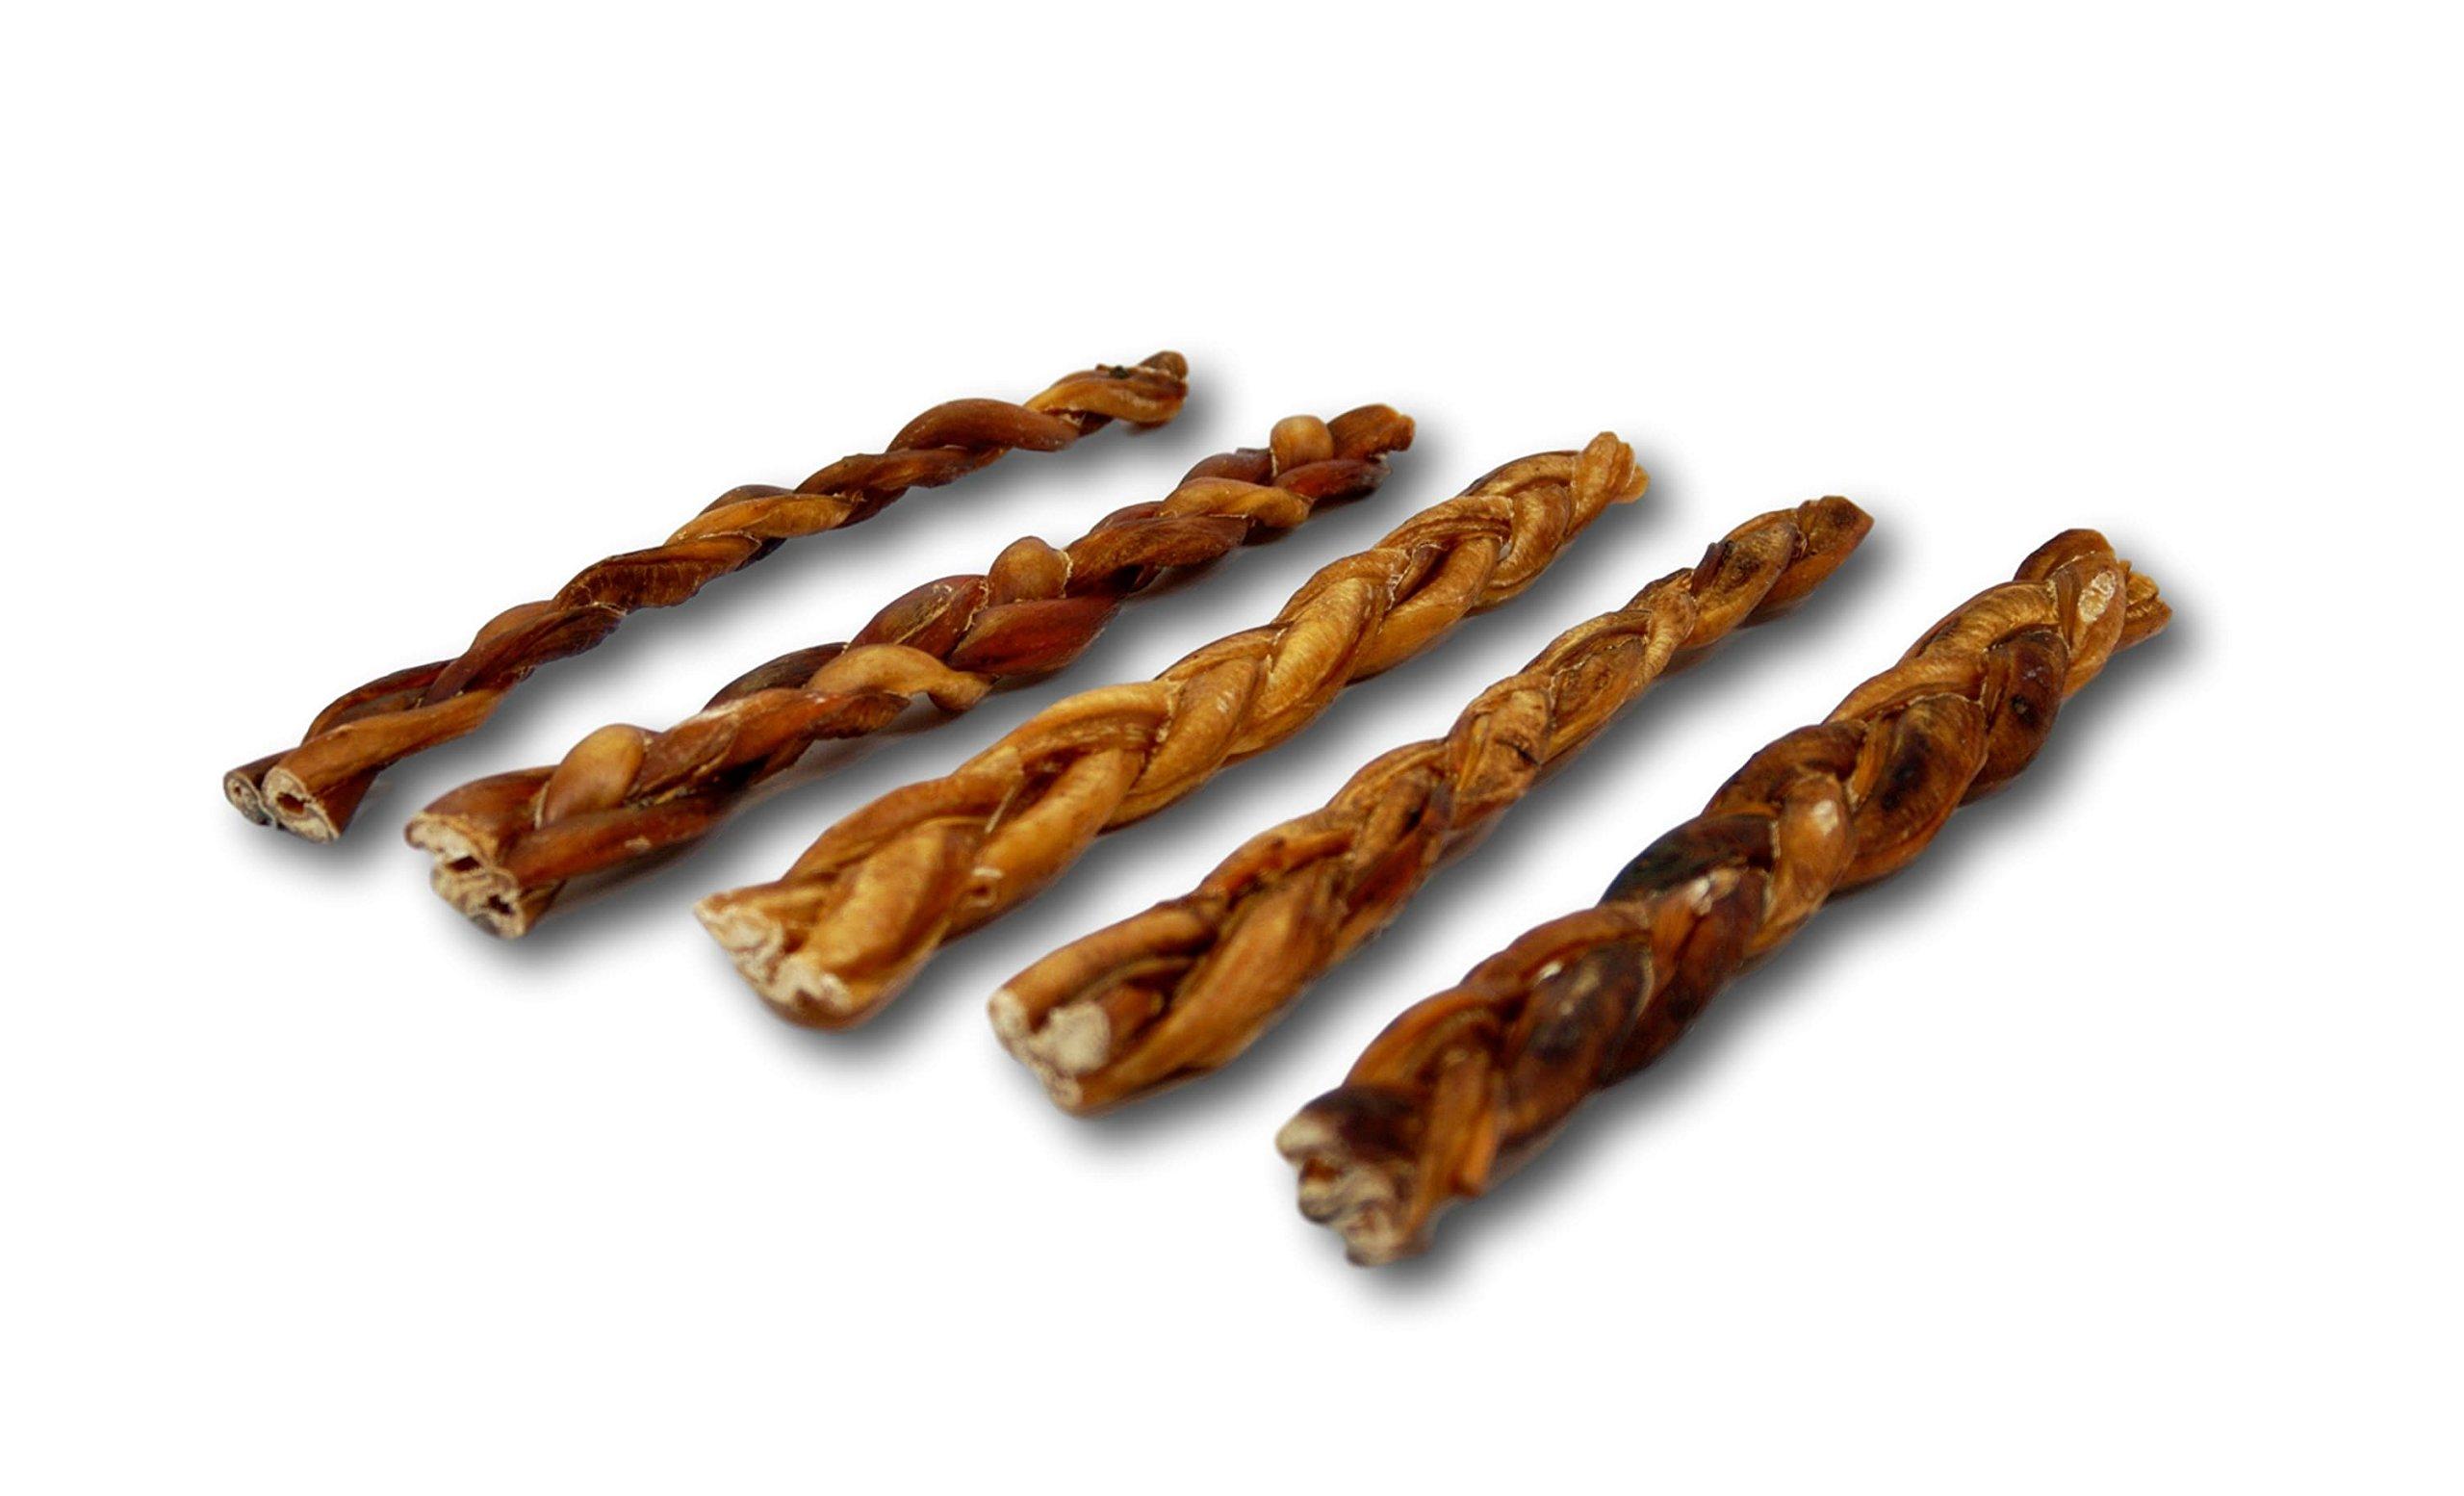 Top Dog Chews 12'' Braided Bully Sticks - 10 Pack